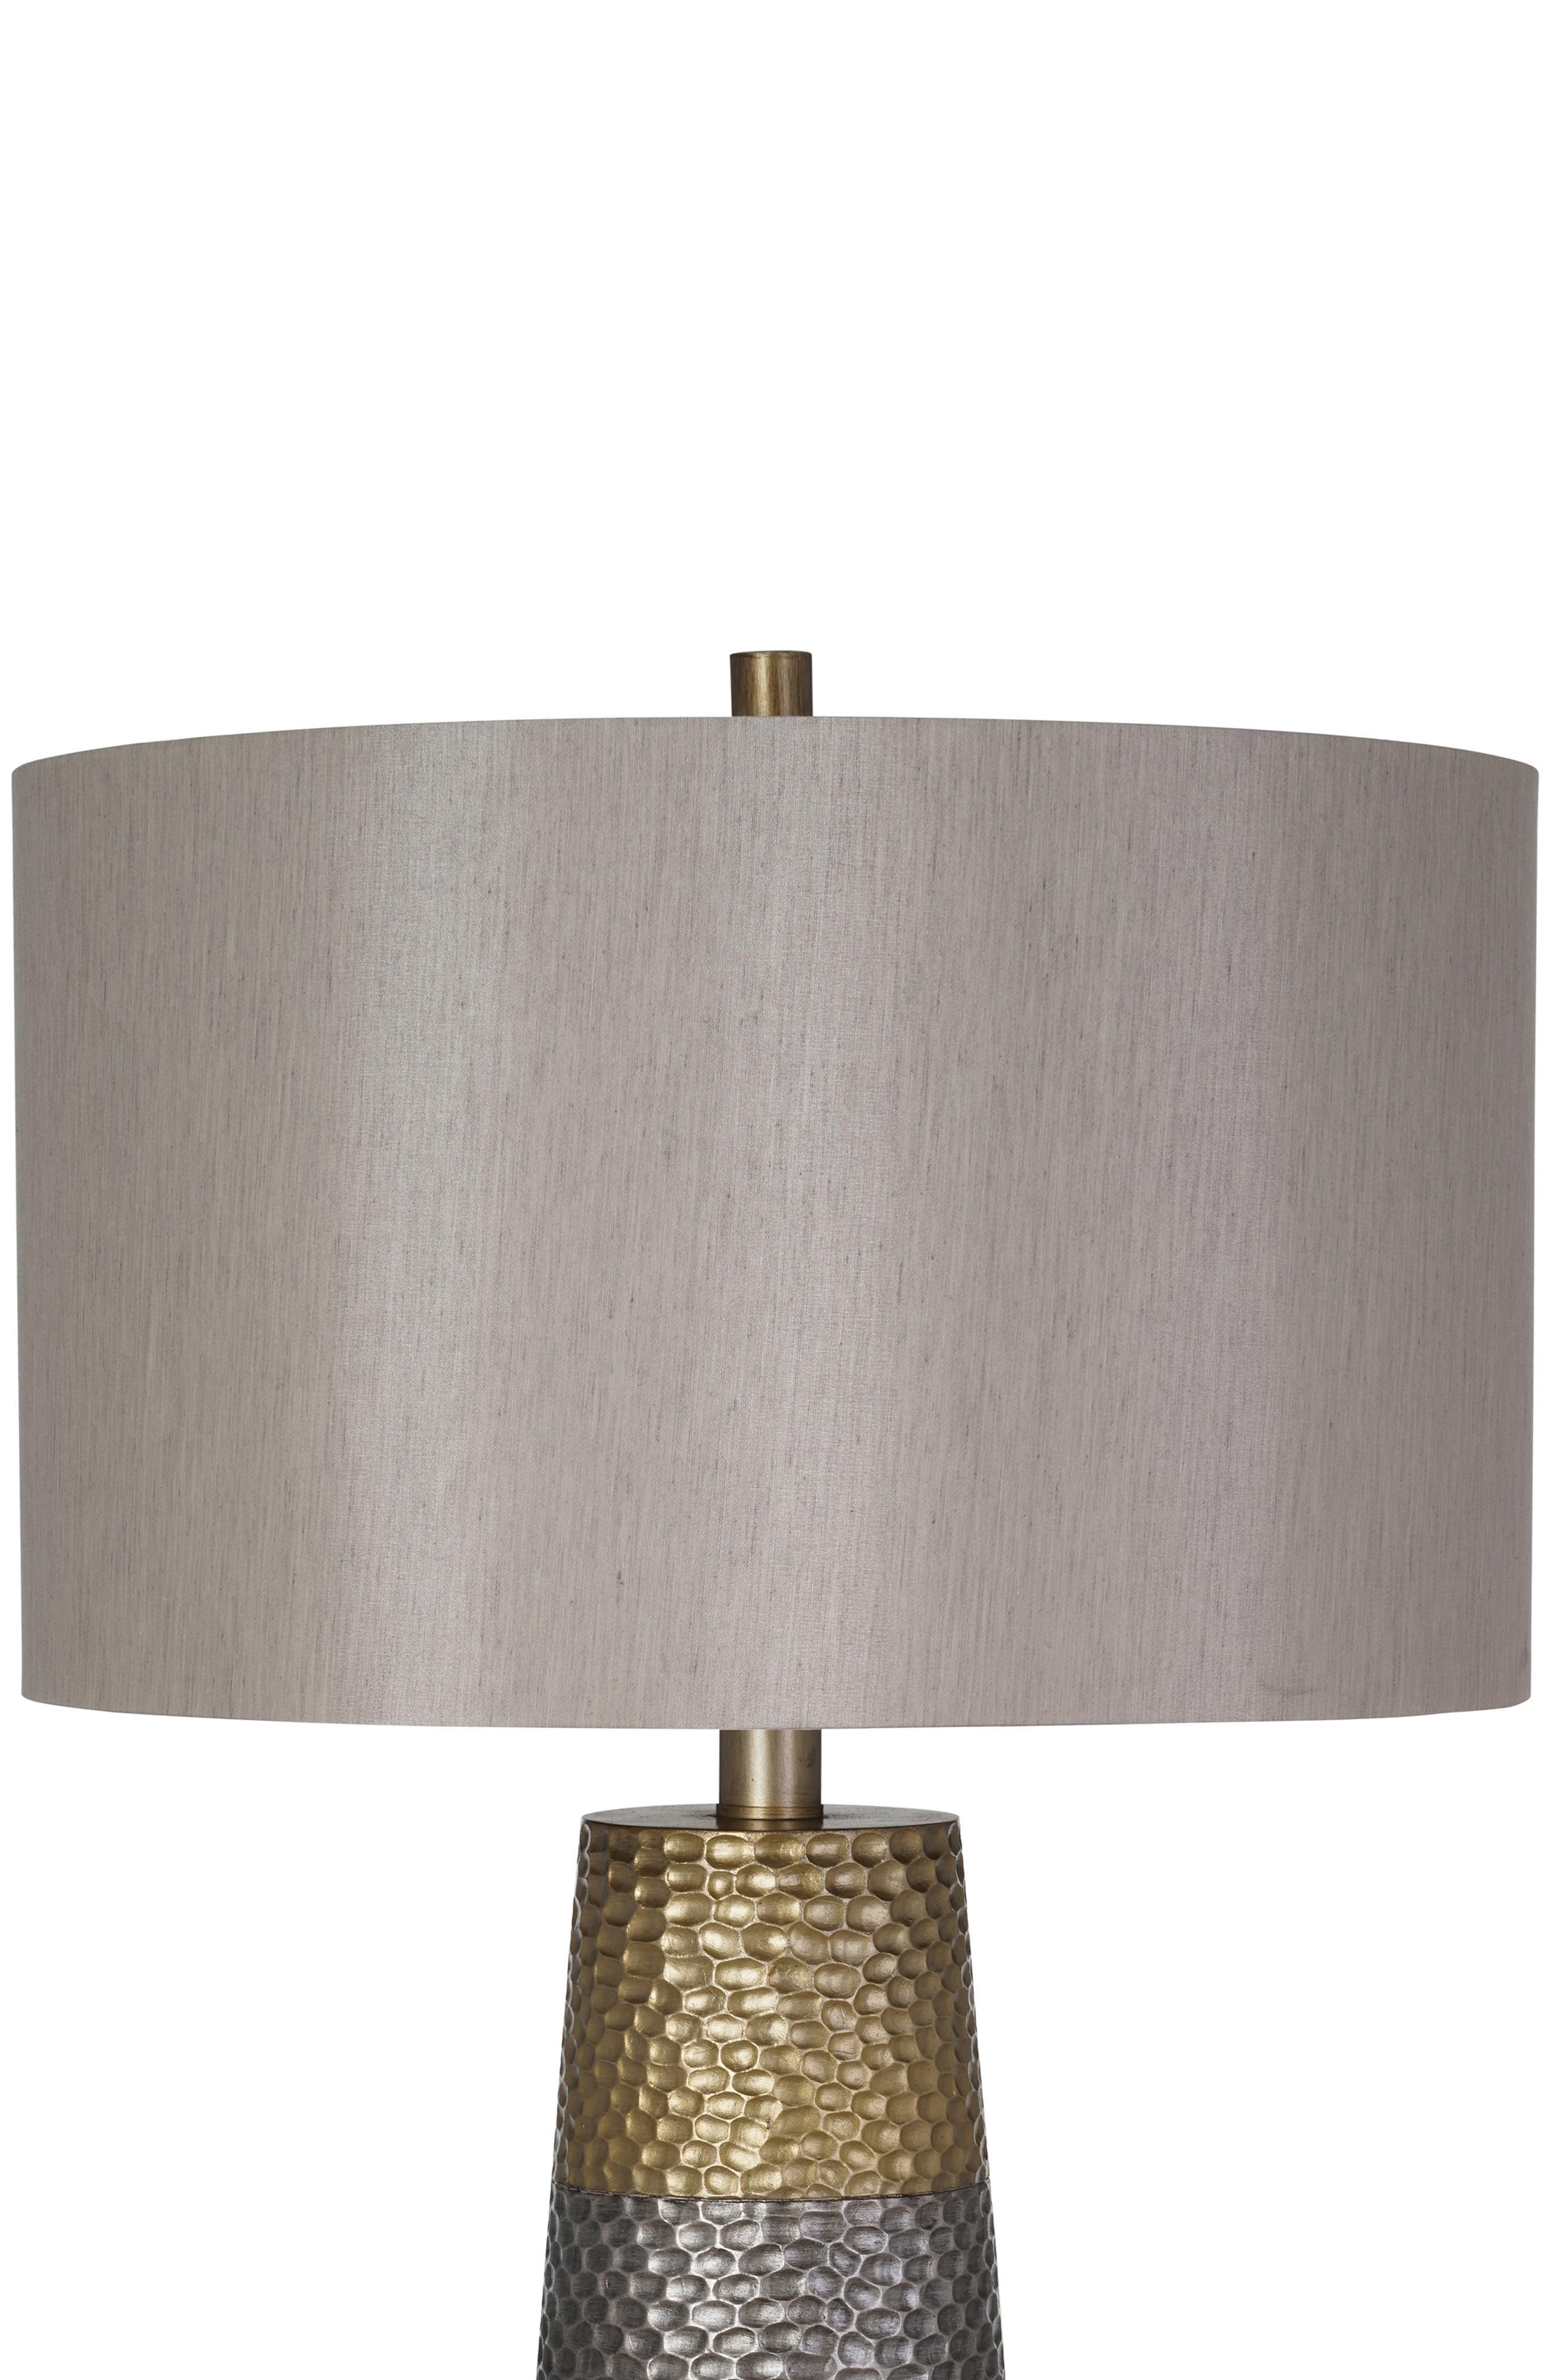 JALEXANDER LIGHTING,                             Delia Table Lamp,                             Alternate thumbnail 3, color,                             048